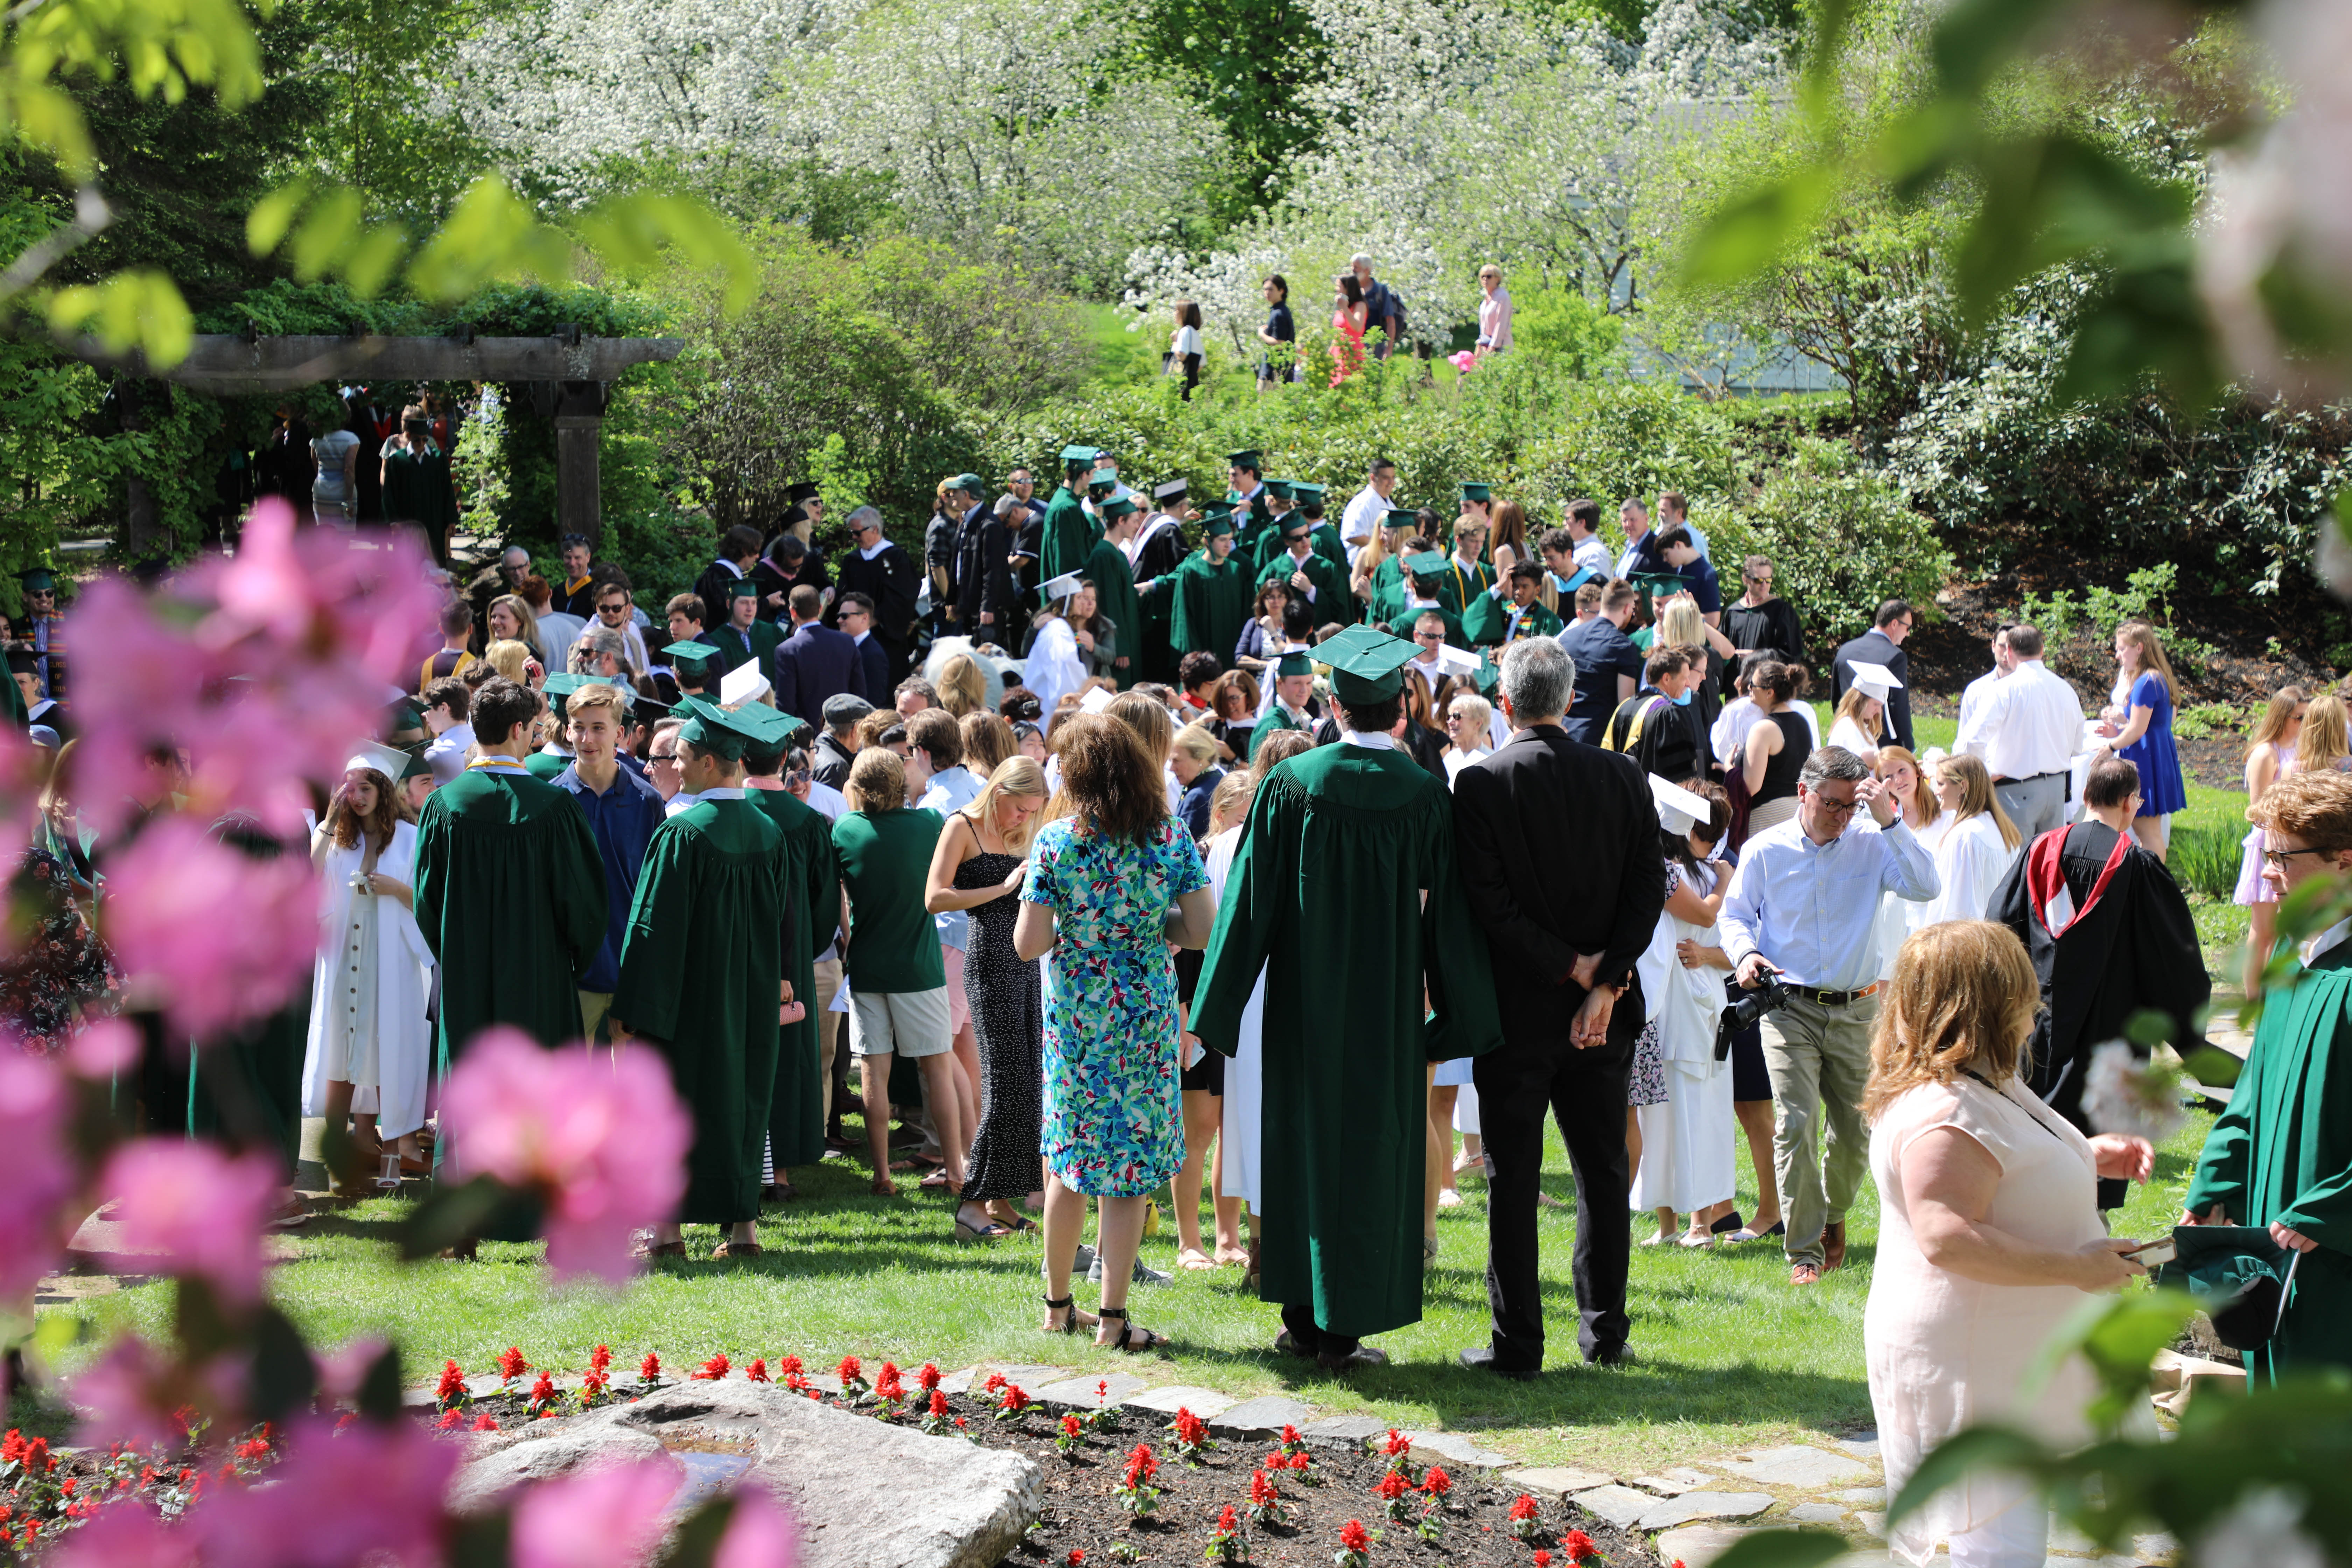 Proctor Academy 2019 graduation